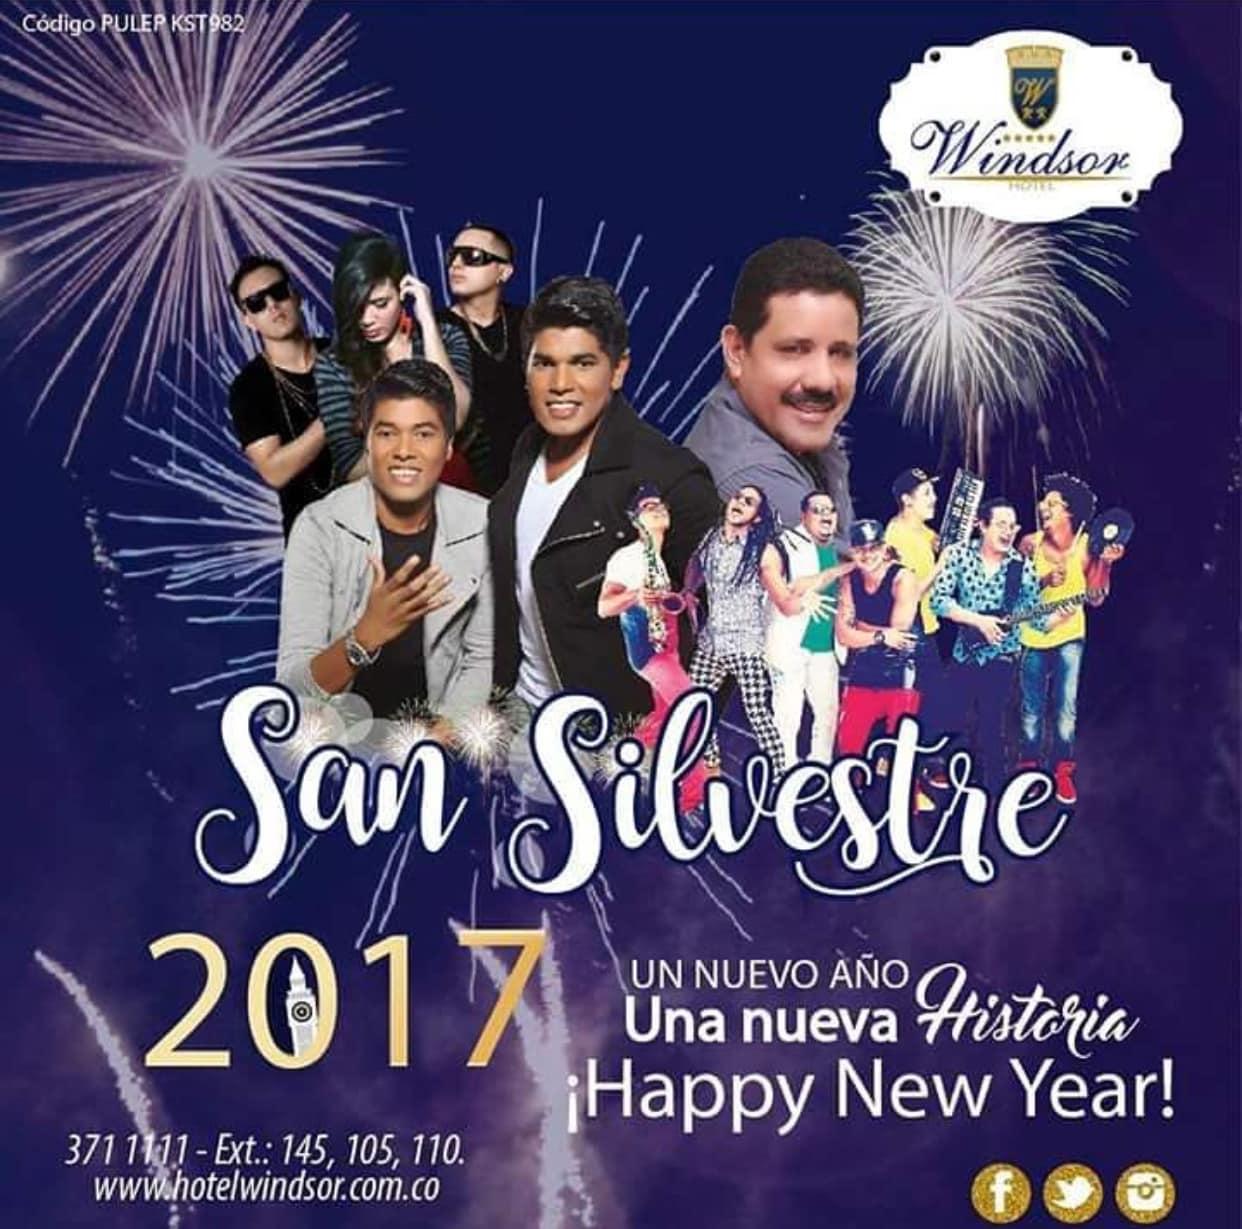 Los K Morales le cantarán a Barranquilla el 31 de Diciembre